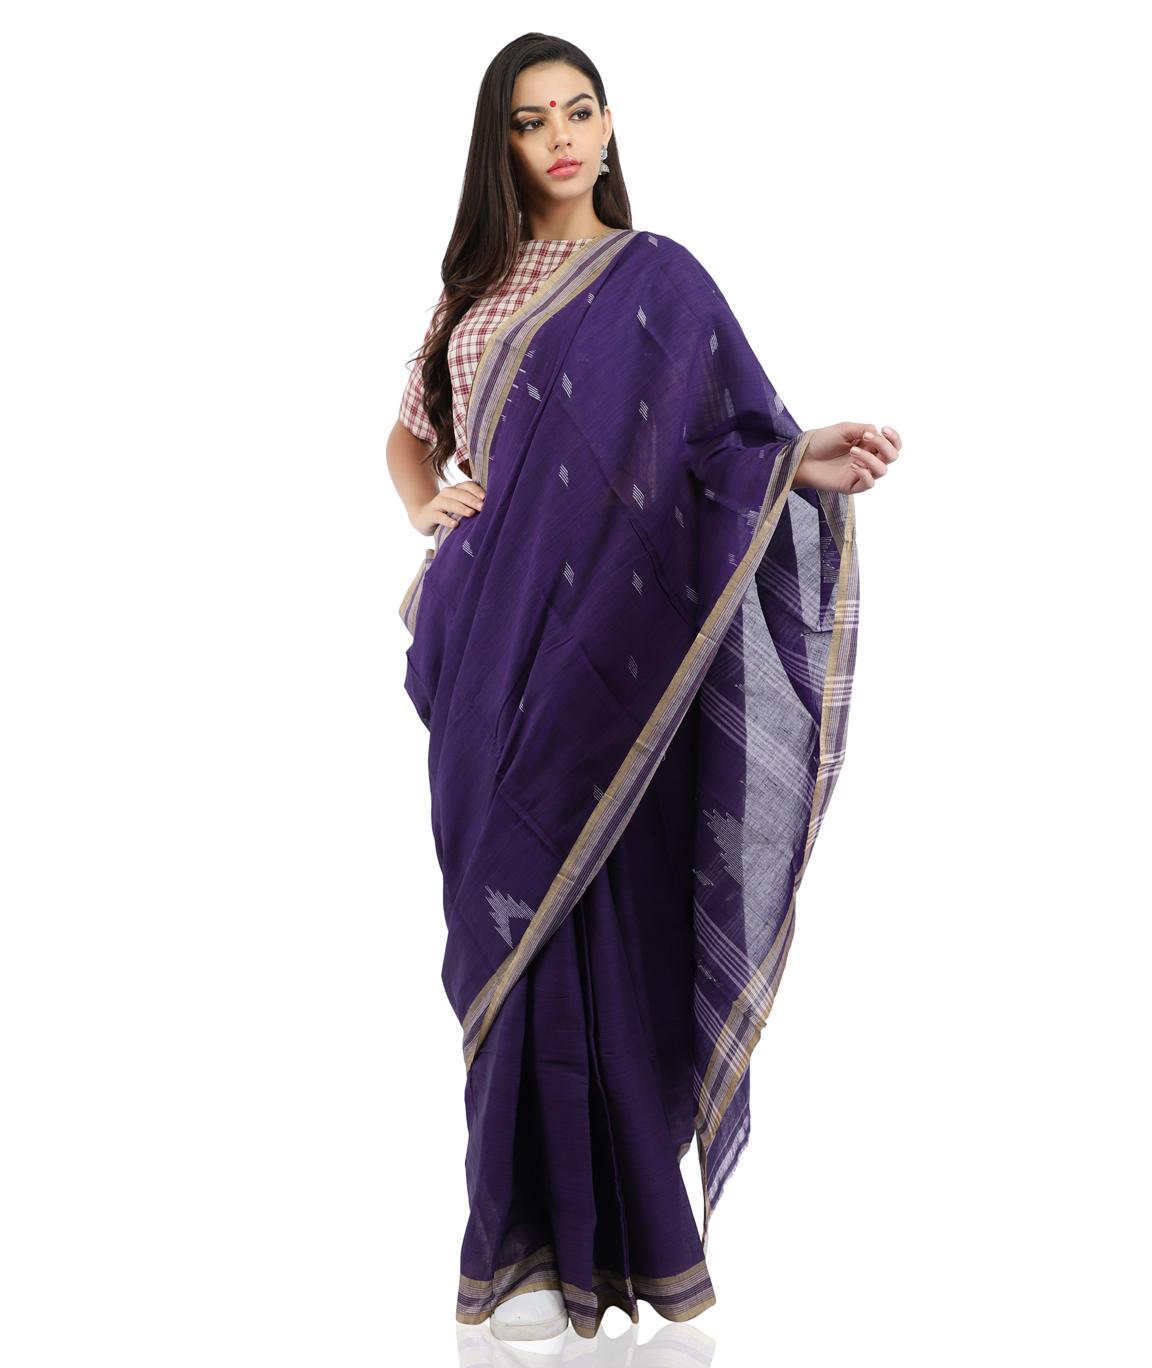 Pure Cotton Handloom Purple Saree With Jamdani Woven(COLOUR : PURPLE)